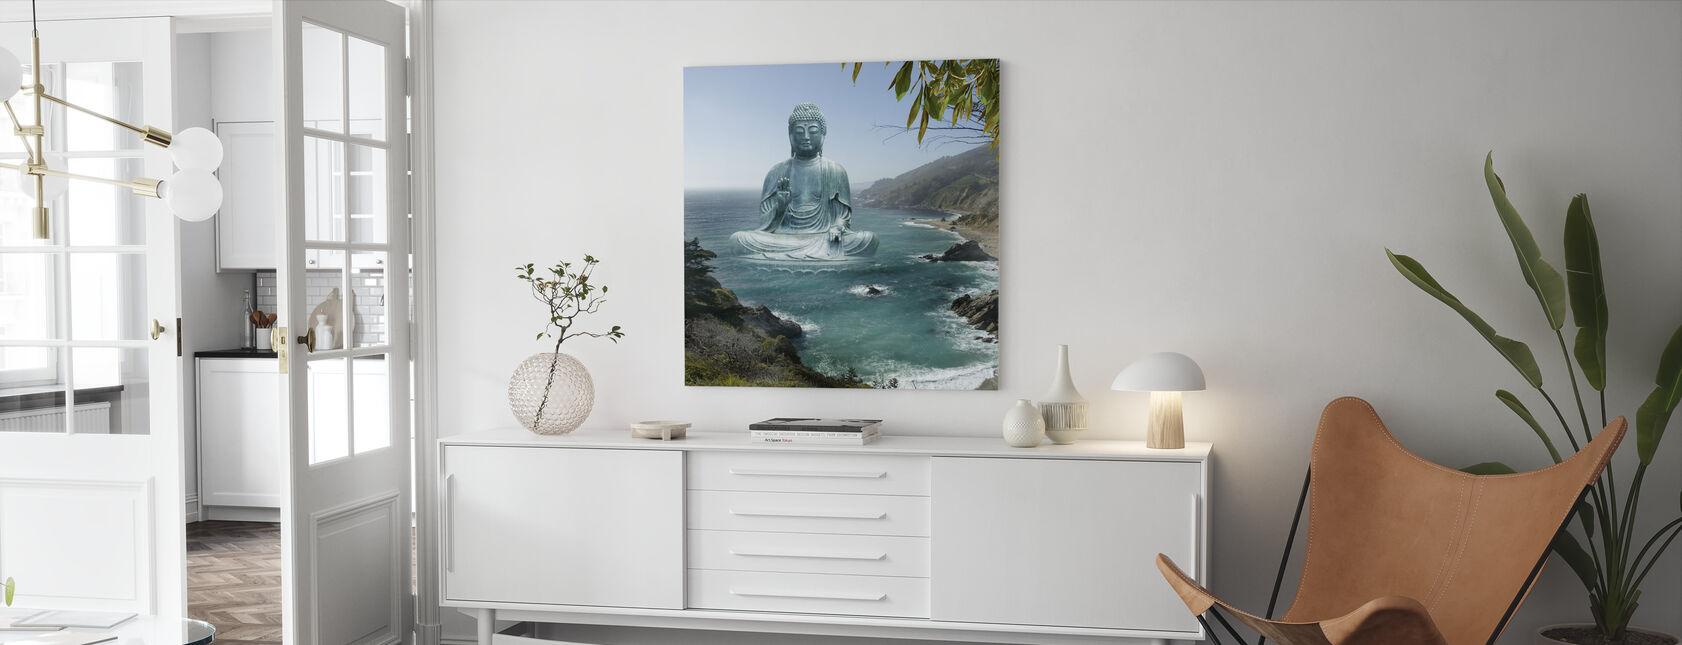 Iso Sur Tea Puutarha Buddha - Canvastaulu - Olohuone